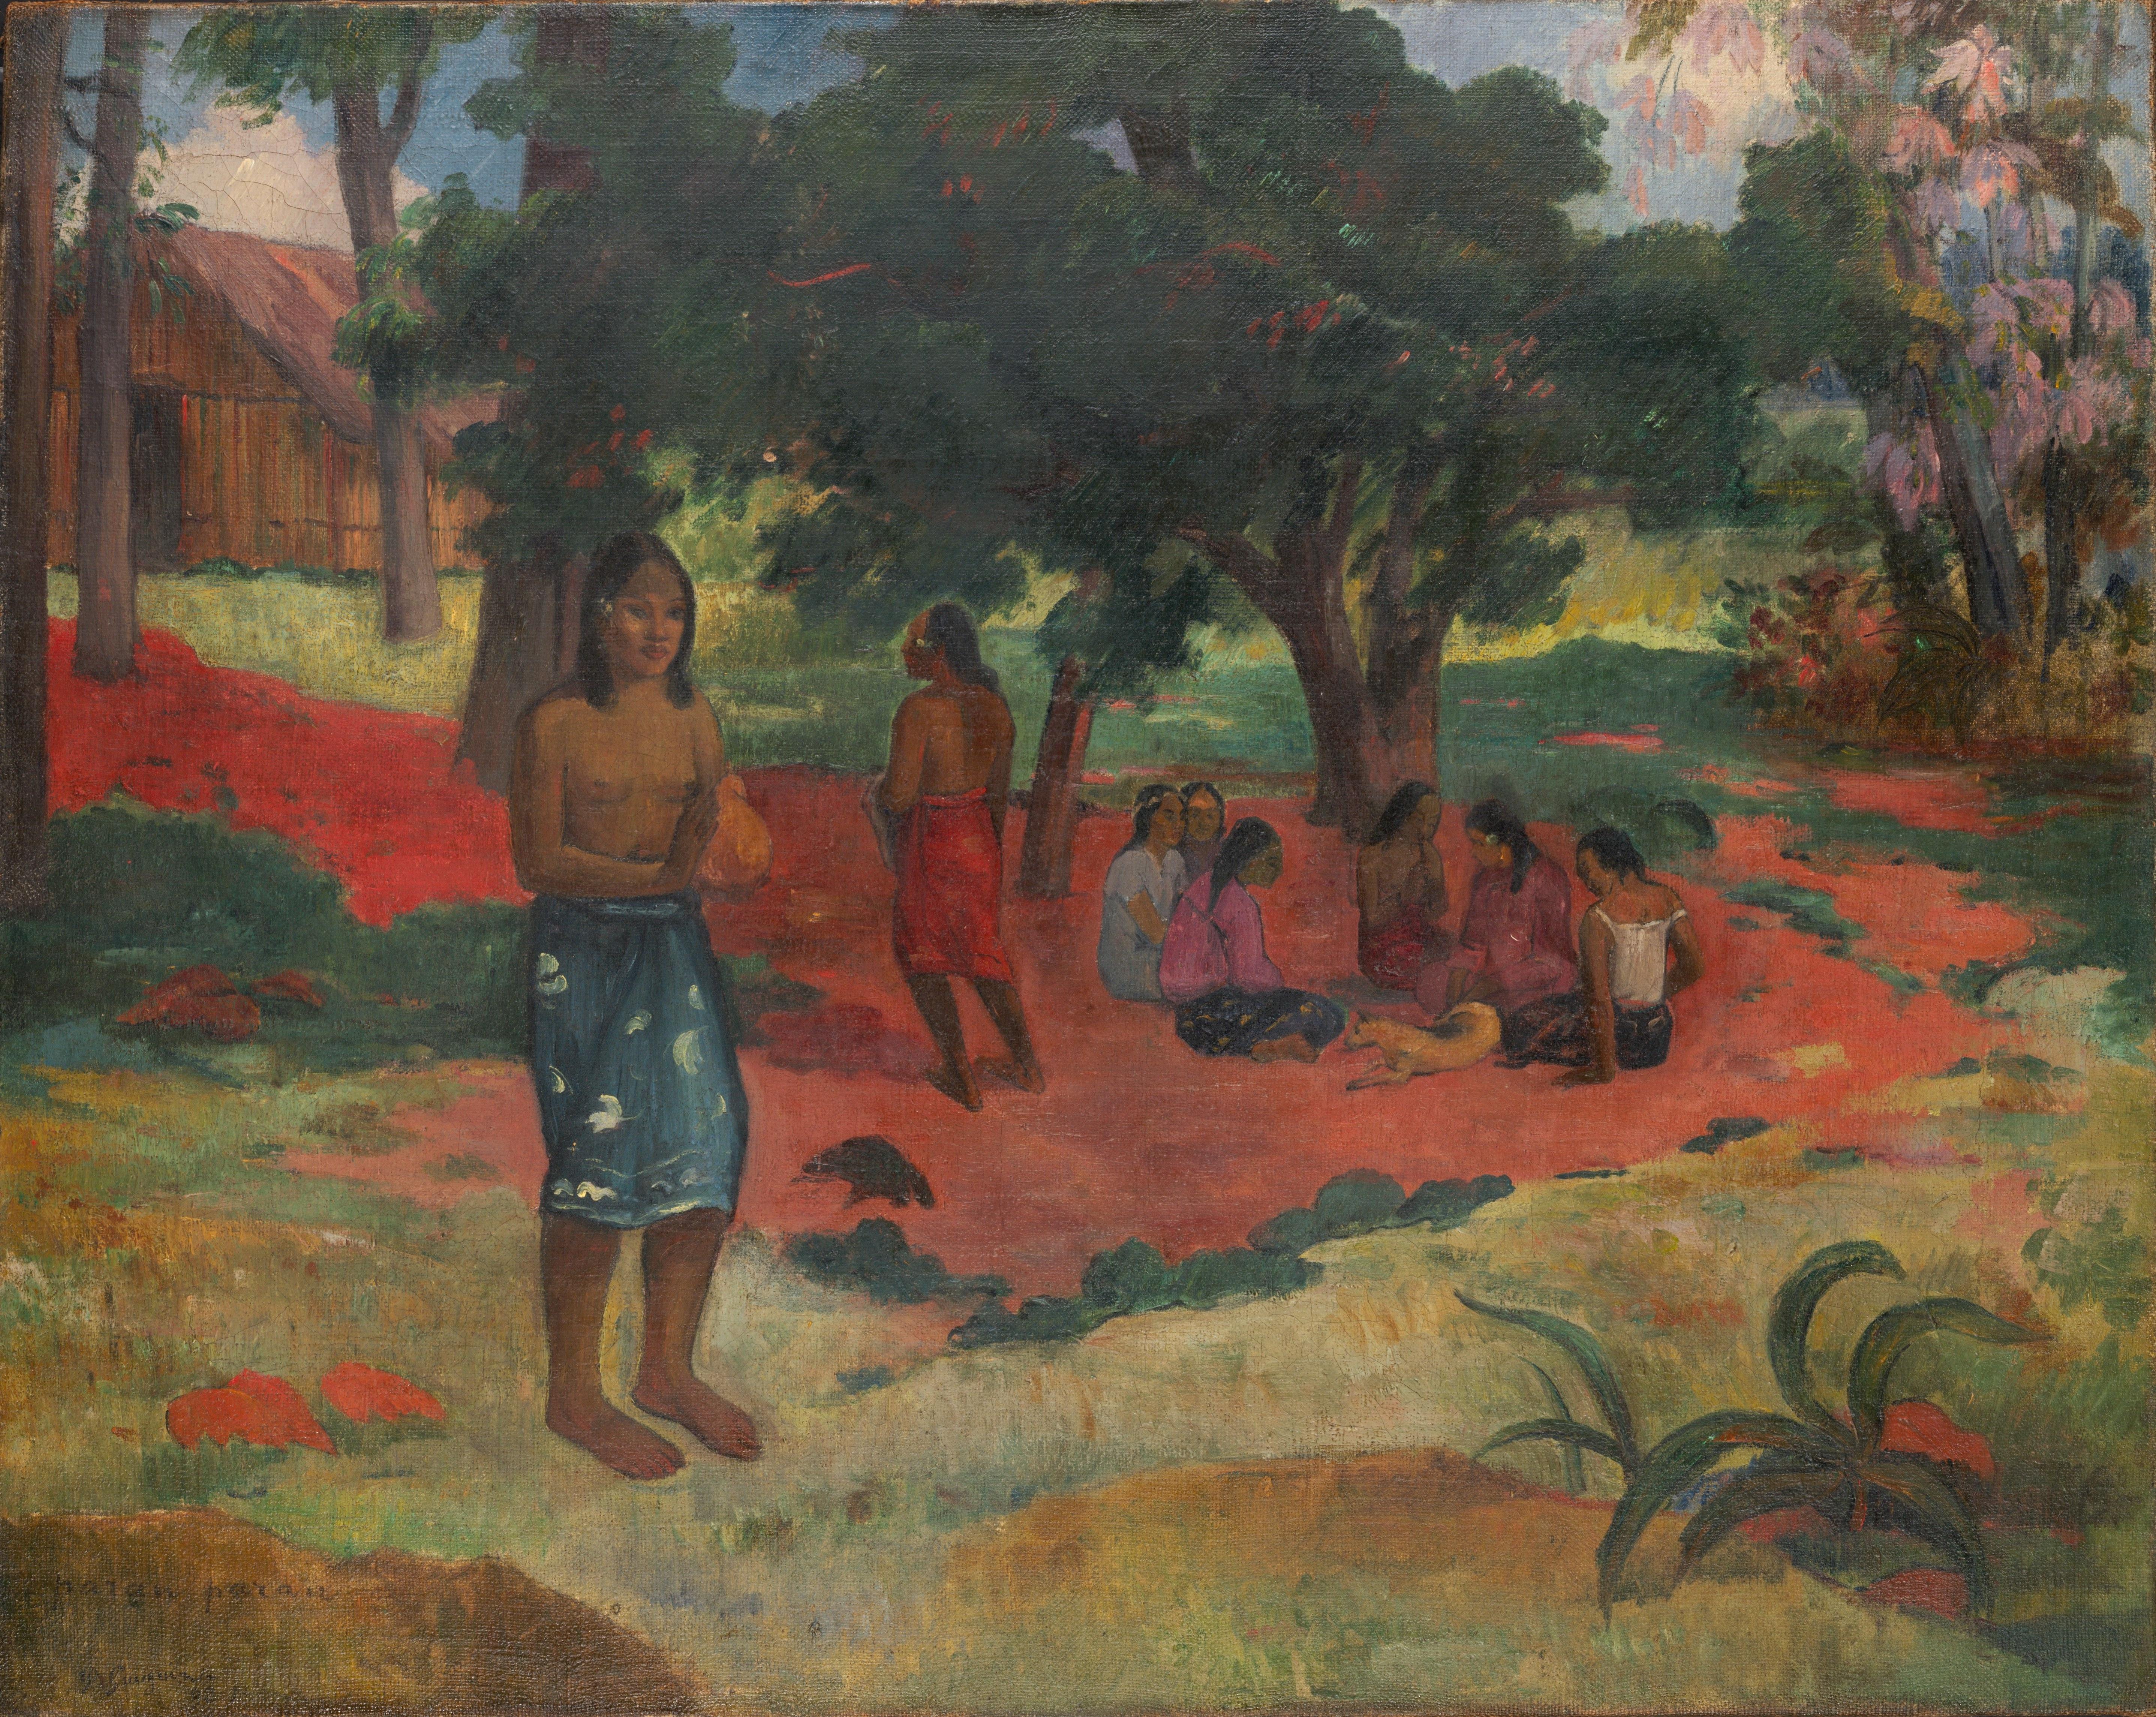 FileParau Parau Whispered Words By Paul Gauguin 1892jpeg